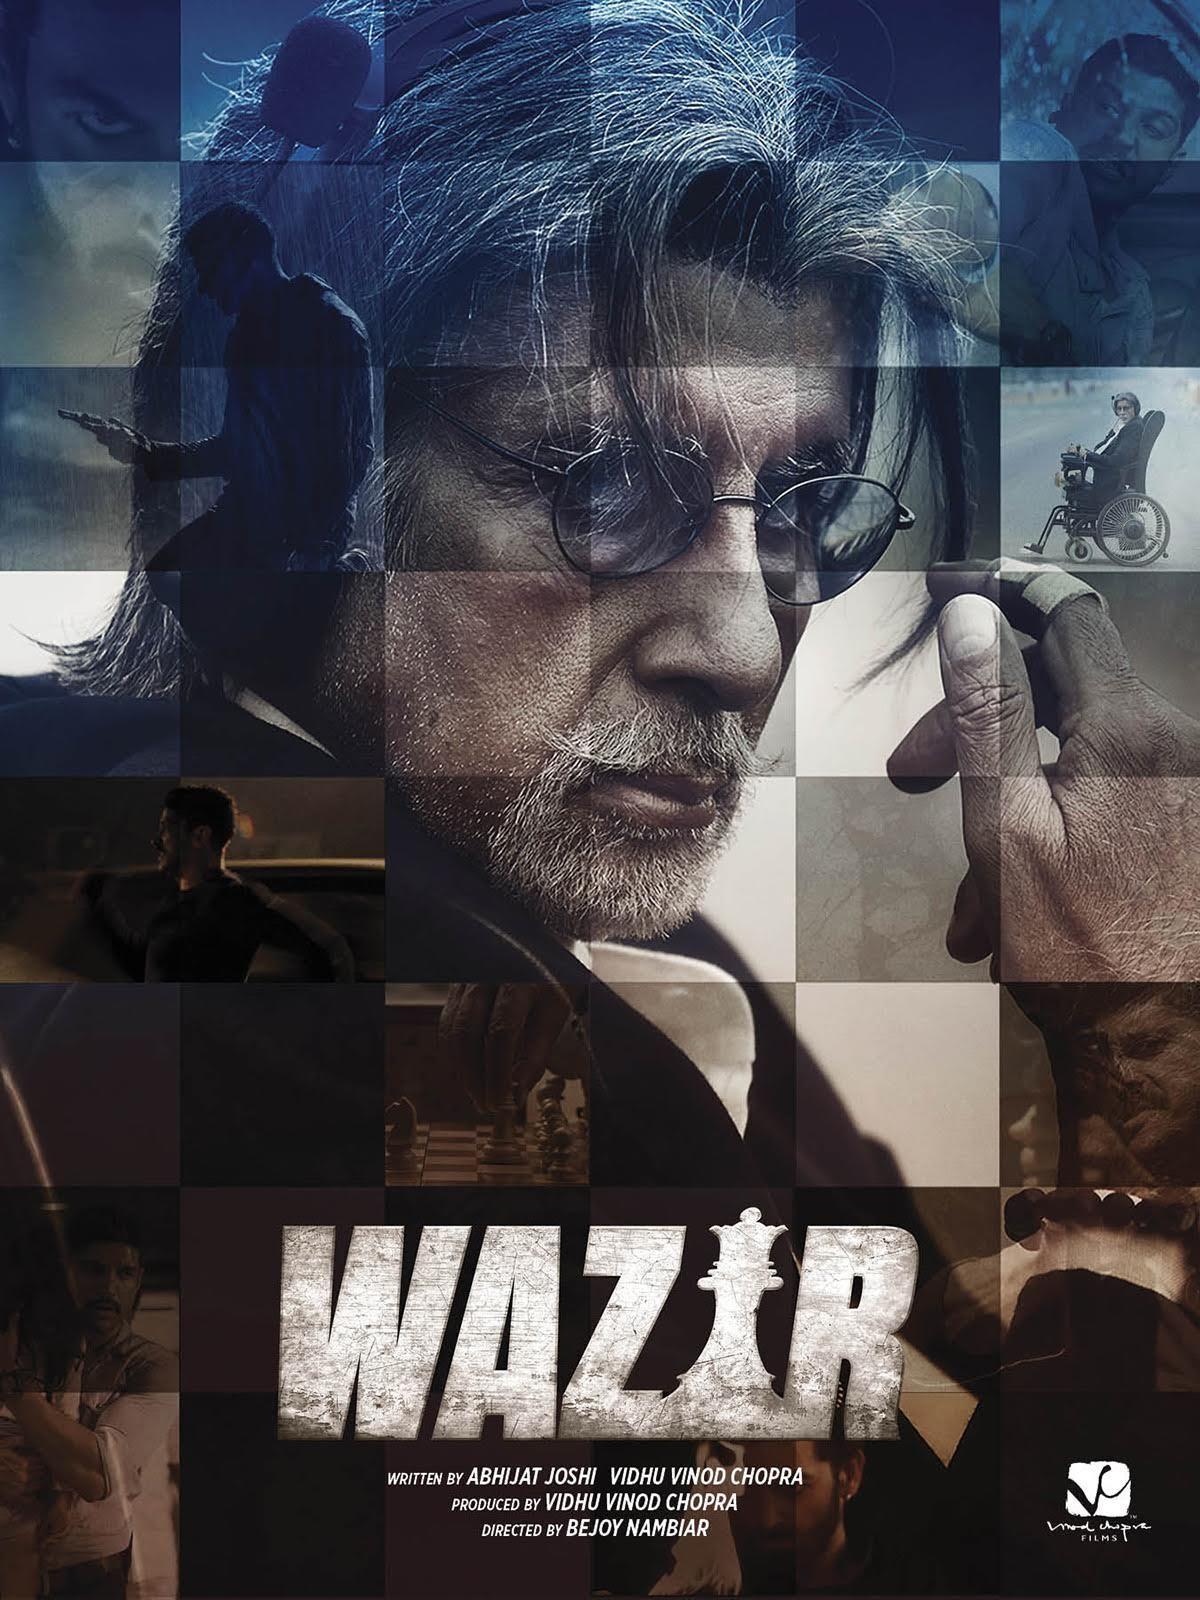 WAZIR (2016) con FARHAN AKTAR + Jukebox + Sub. Español + Online Fdc516e30ea86ae5580eee47c832b928